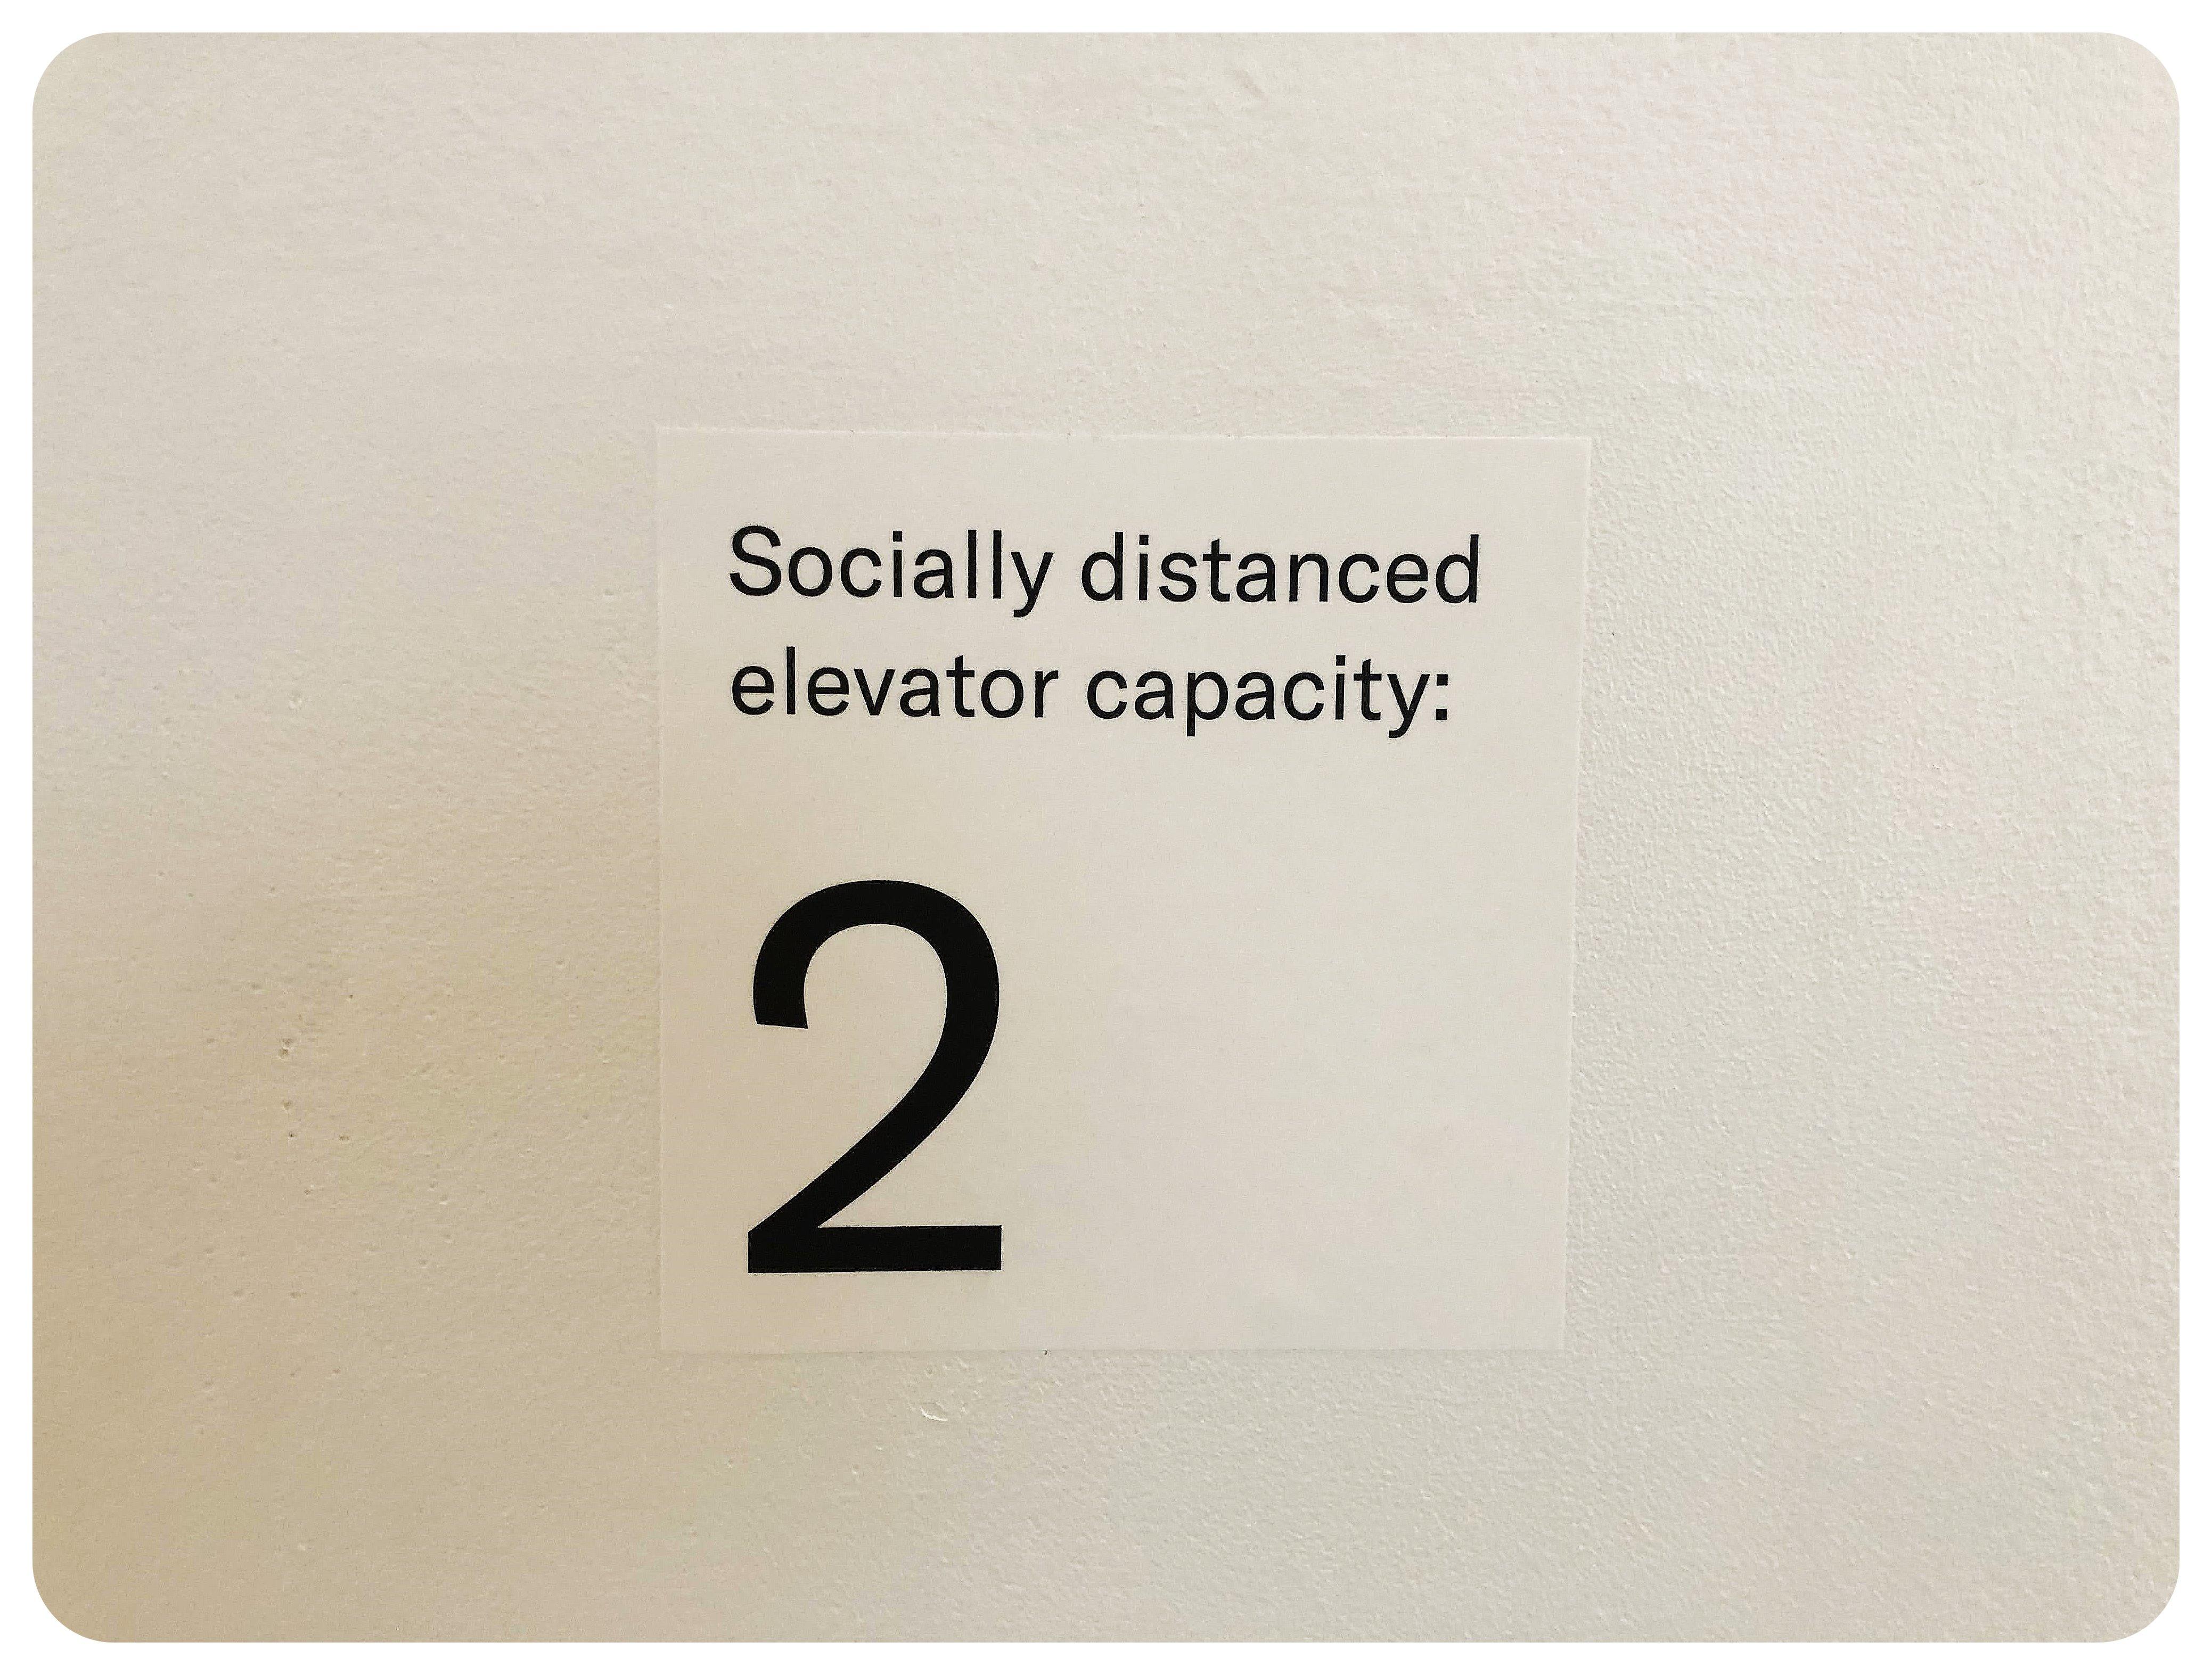 Social distancing NYC